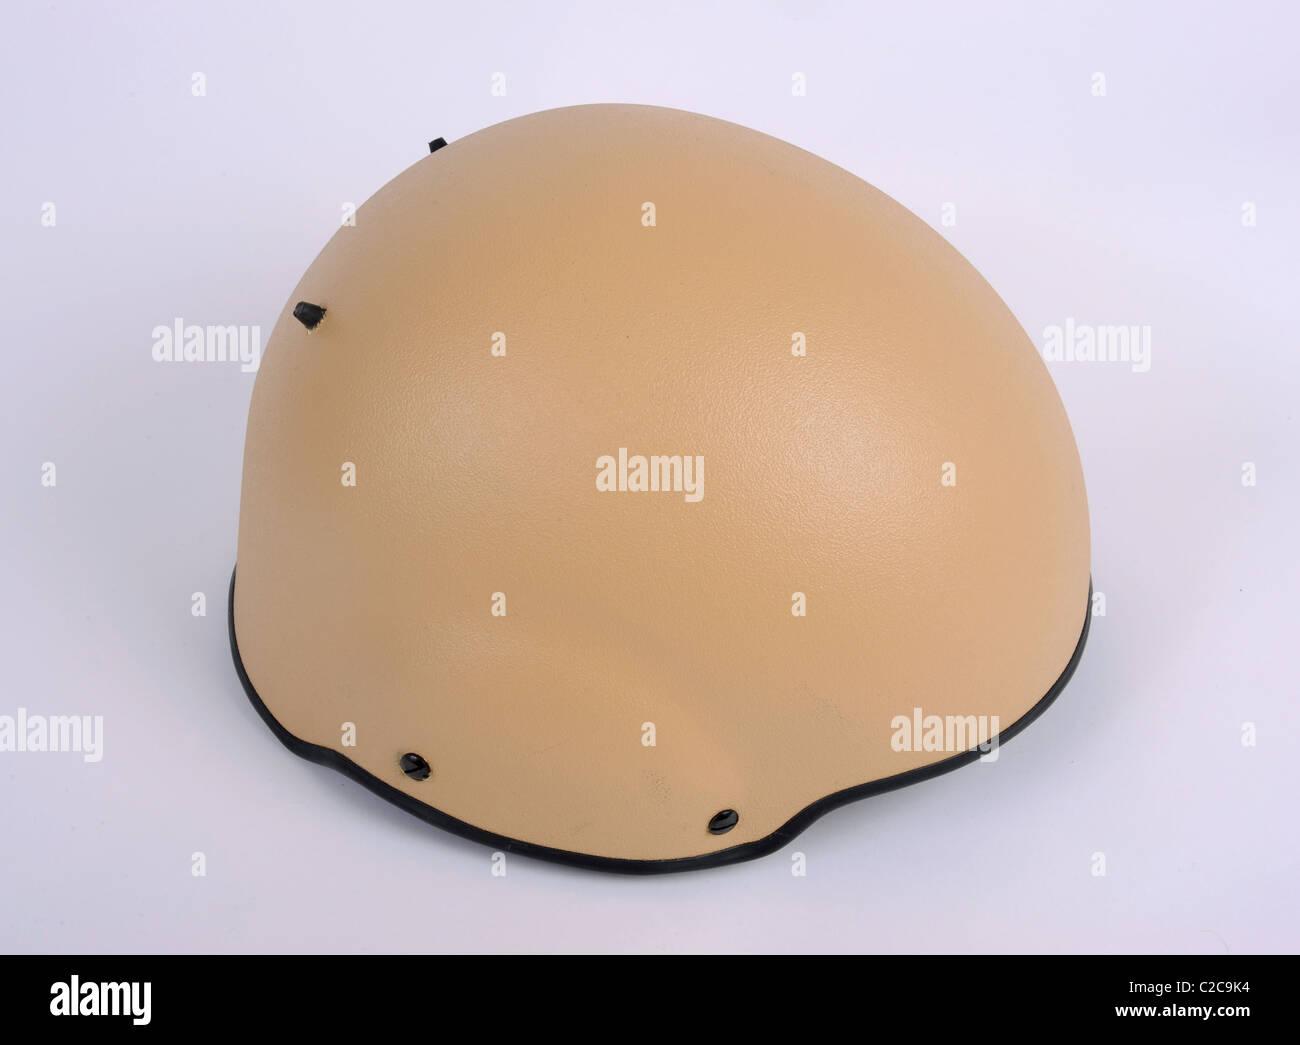 The latest in combat helmet technology. The British general service mark 7 helmet. - Stock Image